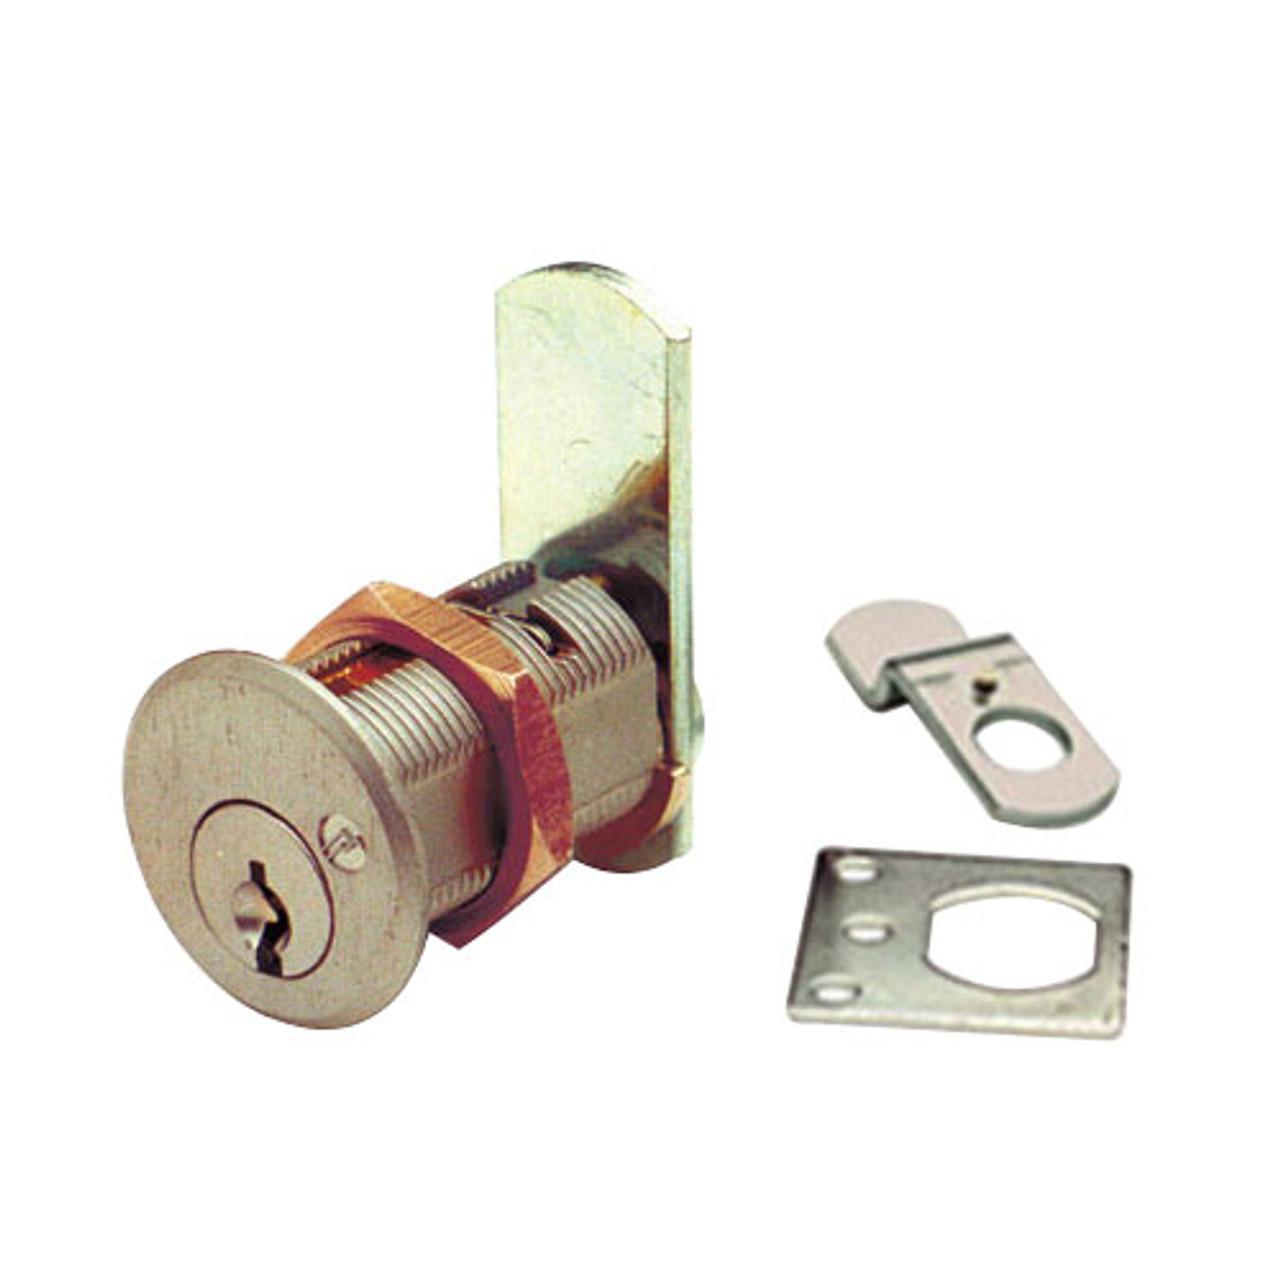 Olympus DCN4-KA101-US3 Cam Locks in Bright Brass Finish